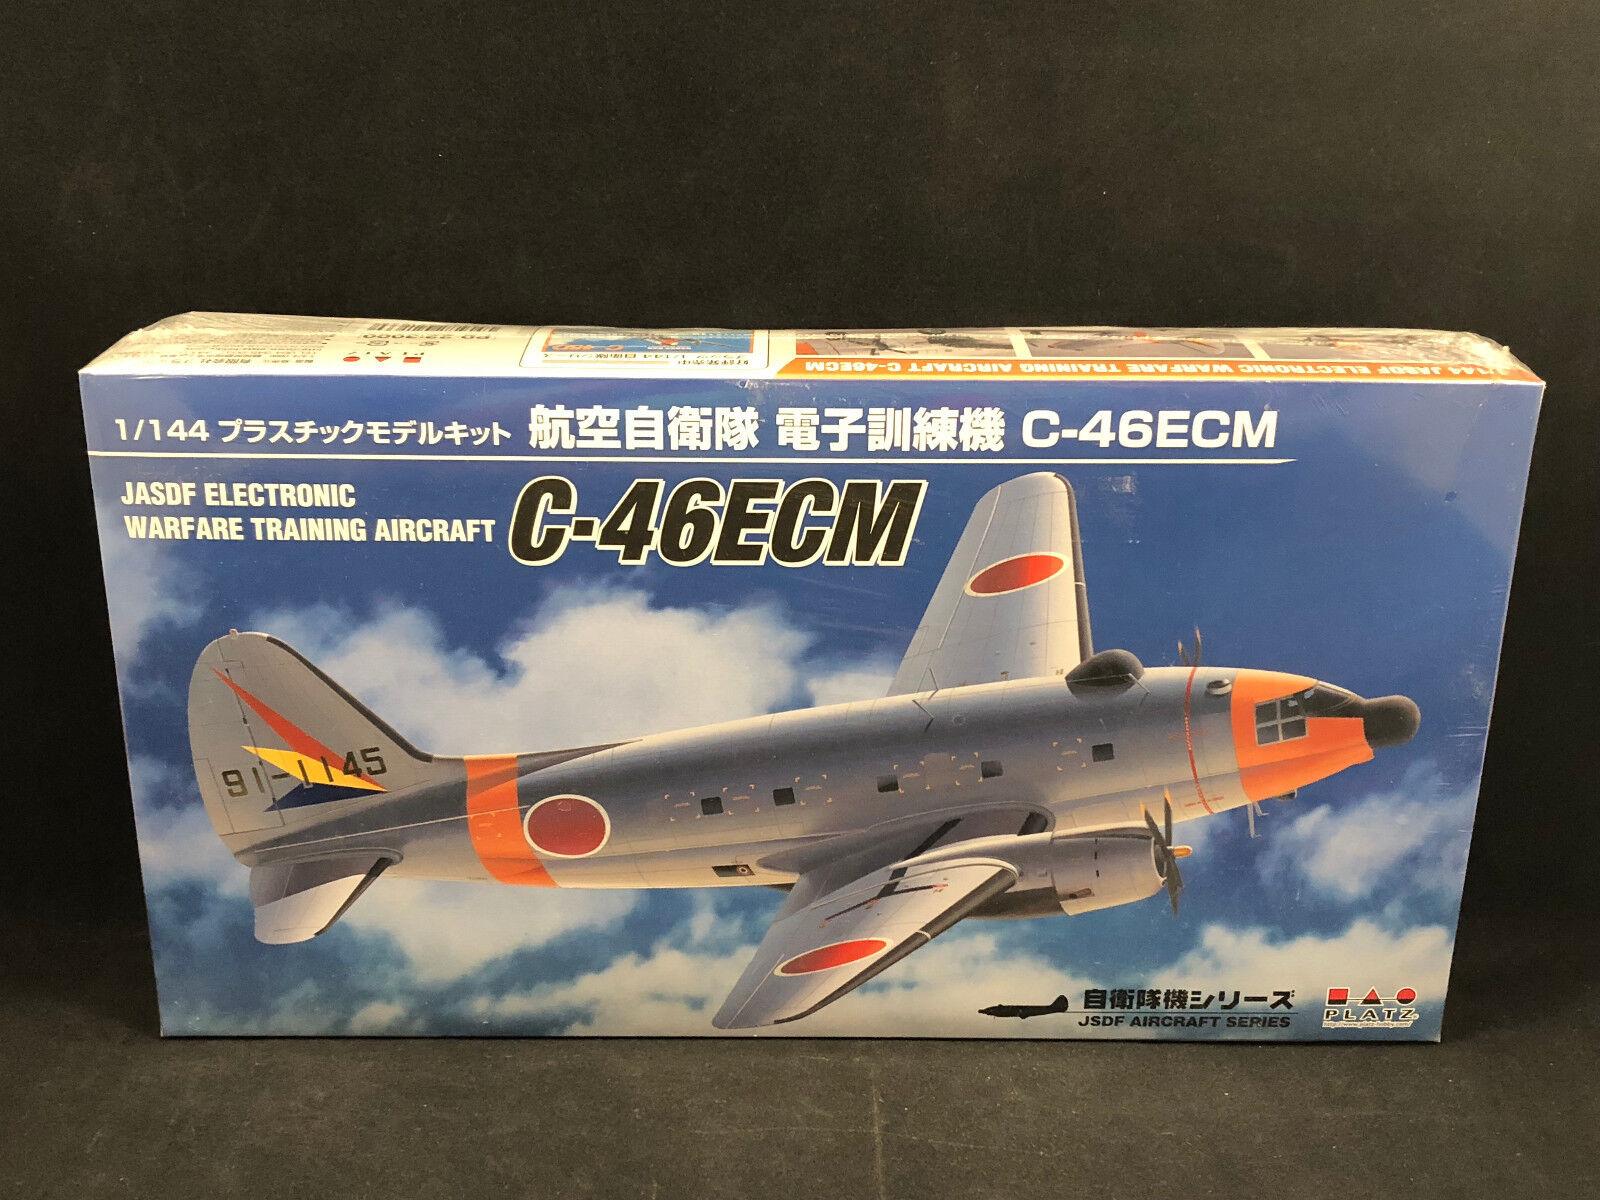 Platz C-46ECM JASDF Training Aircraft 1 144 Scale Plastic Model Kit PD-22 NIB